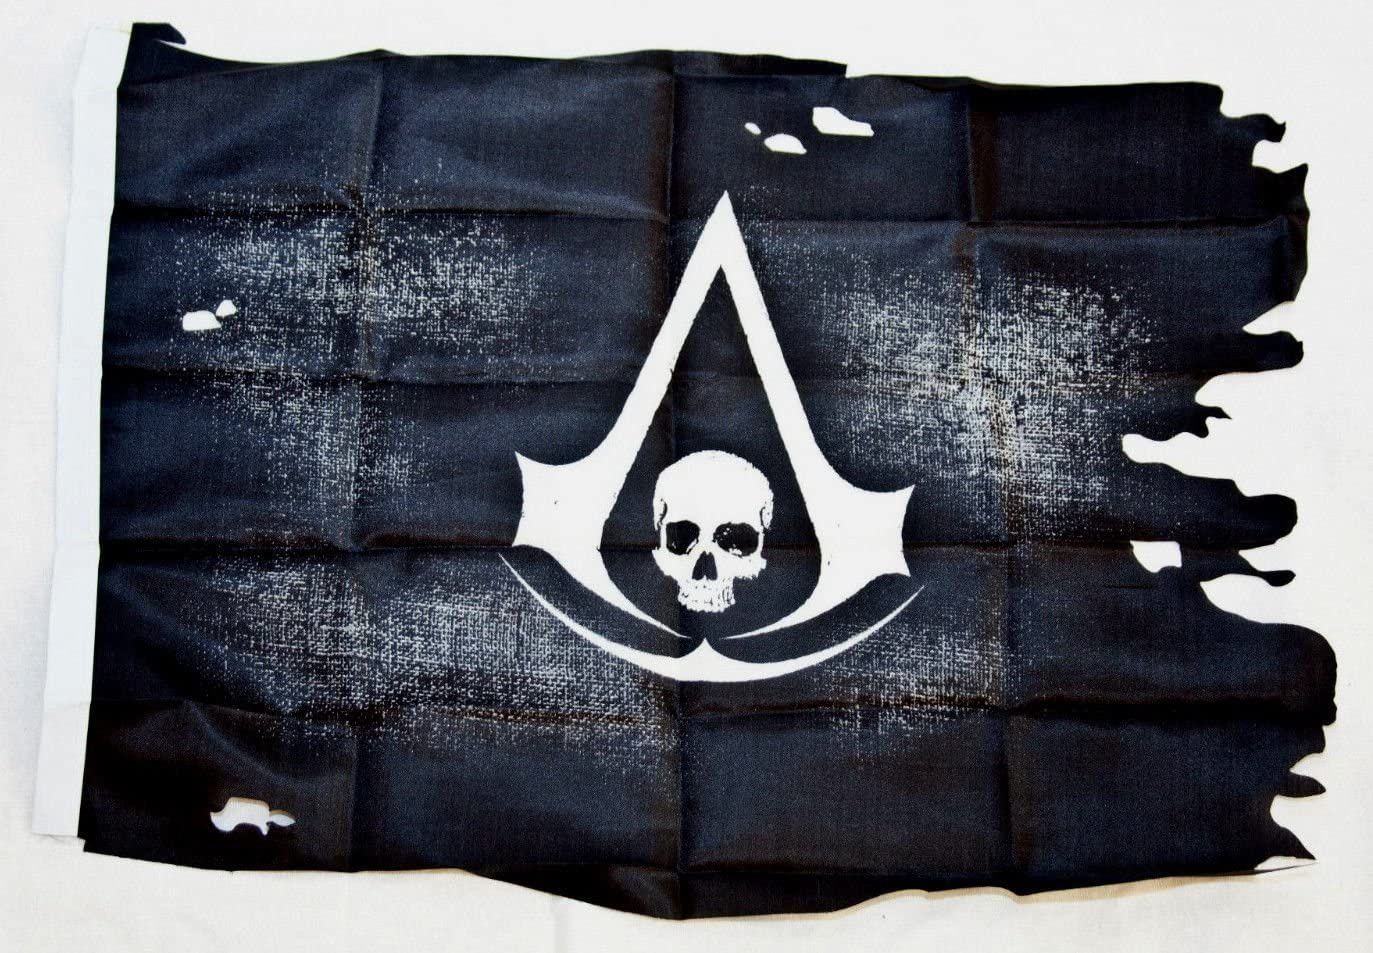 77831385ffbe1 Amazon.com: Assassin's Creed IV 4 Pirate Black Flag Bonus Pre-Order ...